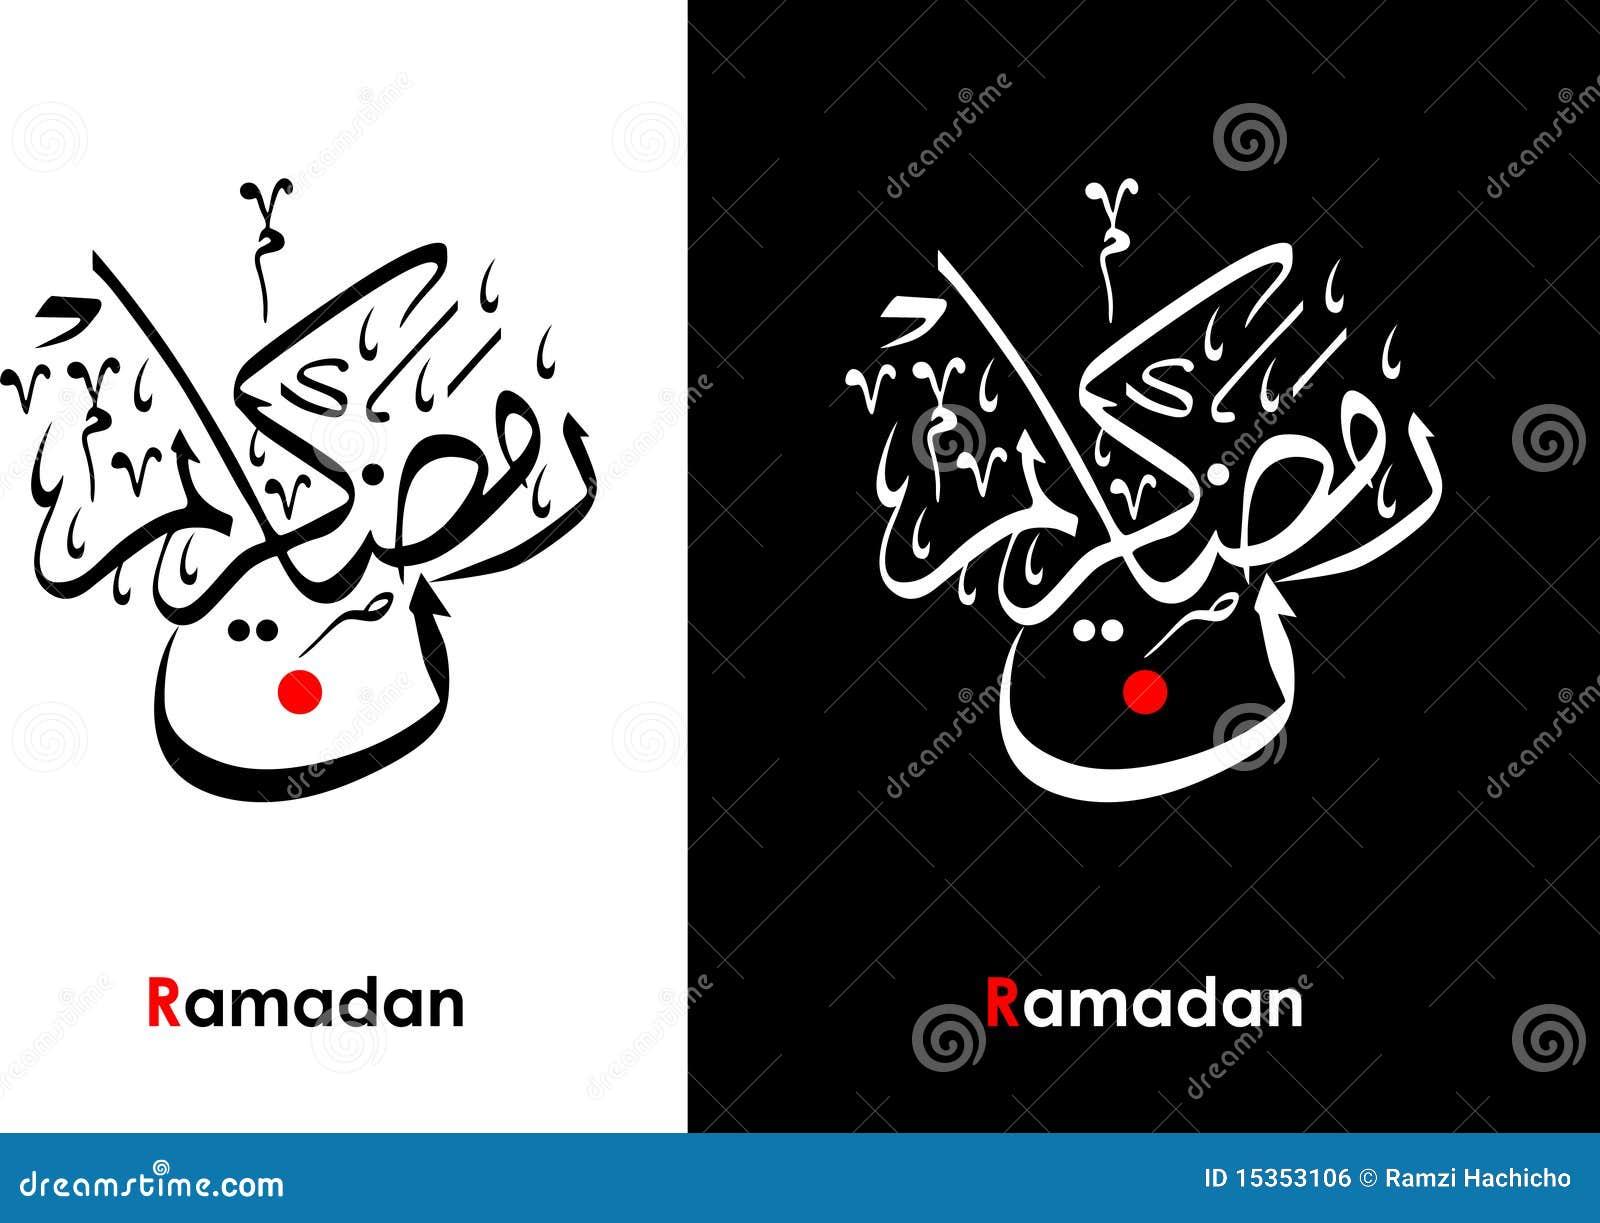 Essay about ramadan